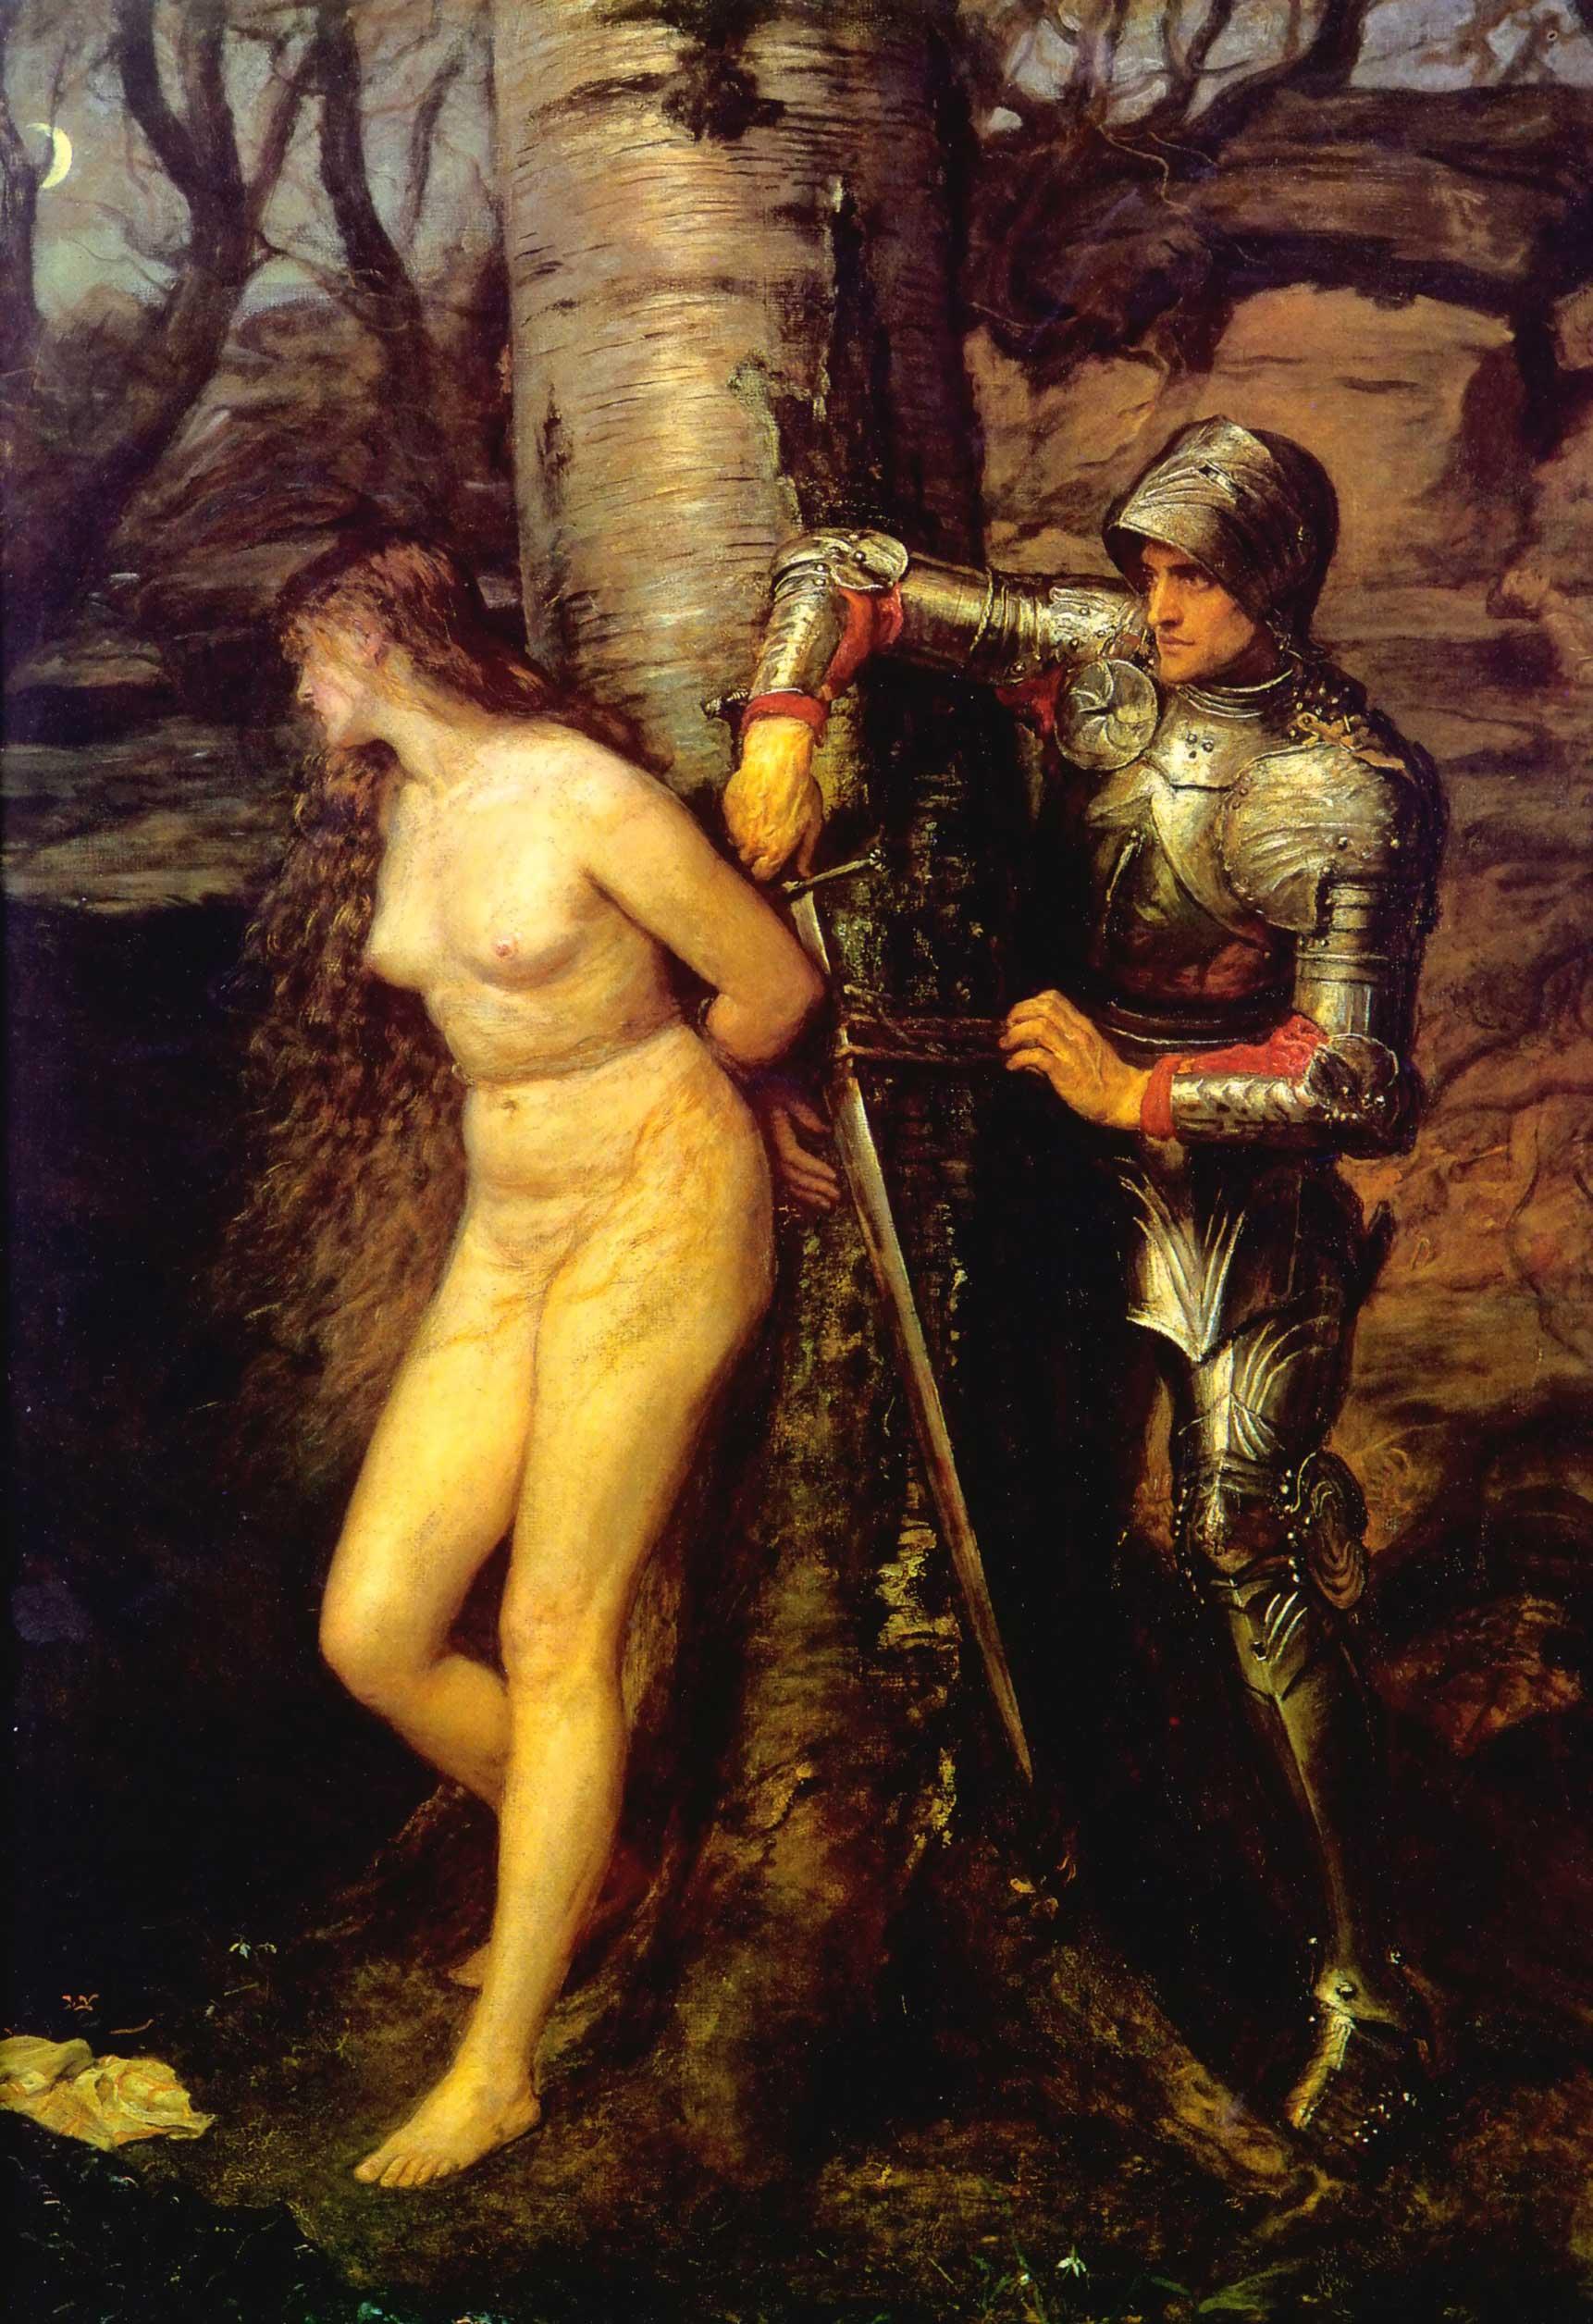 John-Everett-Millais-The-Knight-Errant-1870